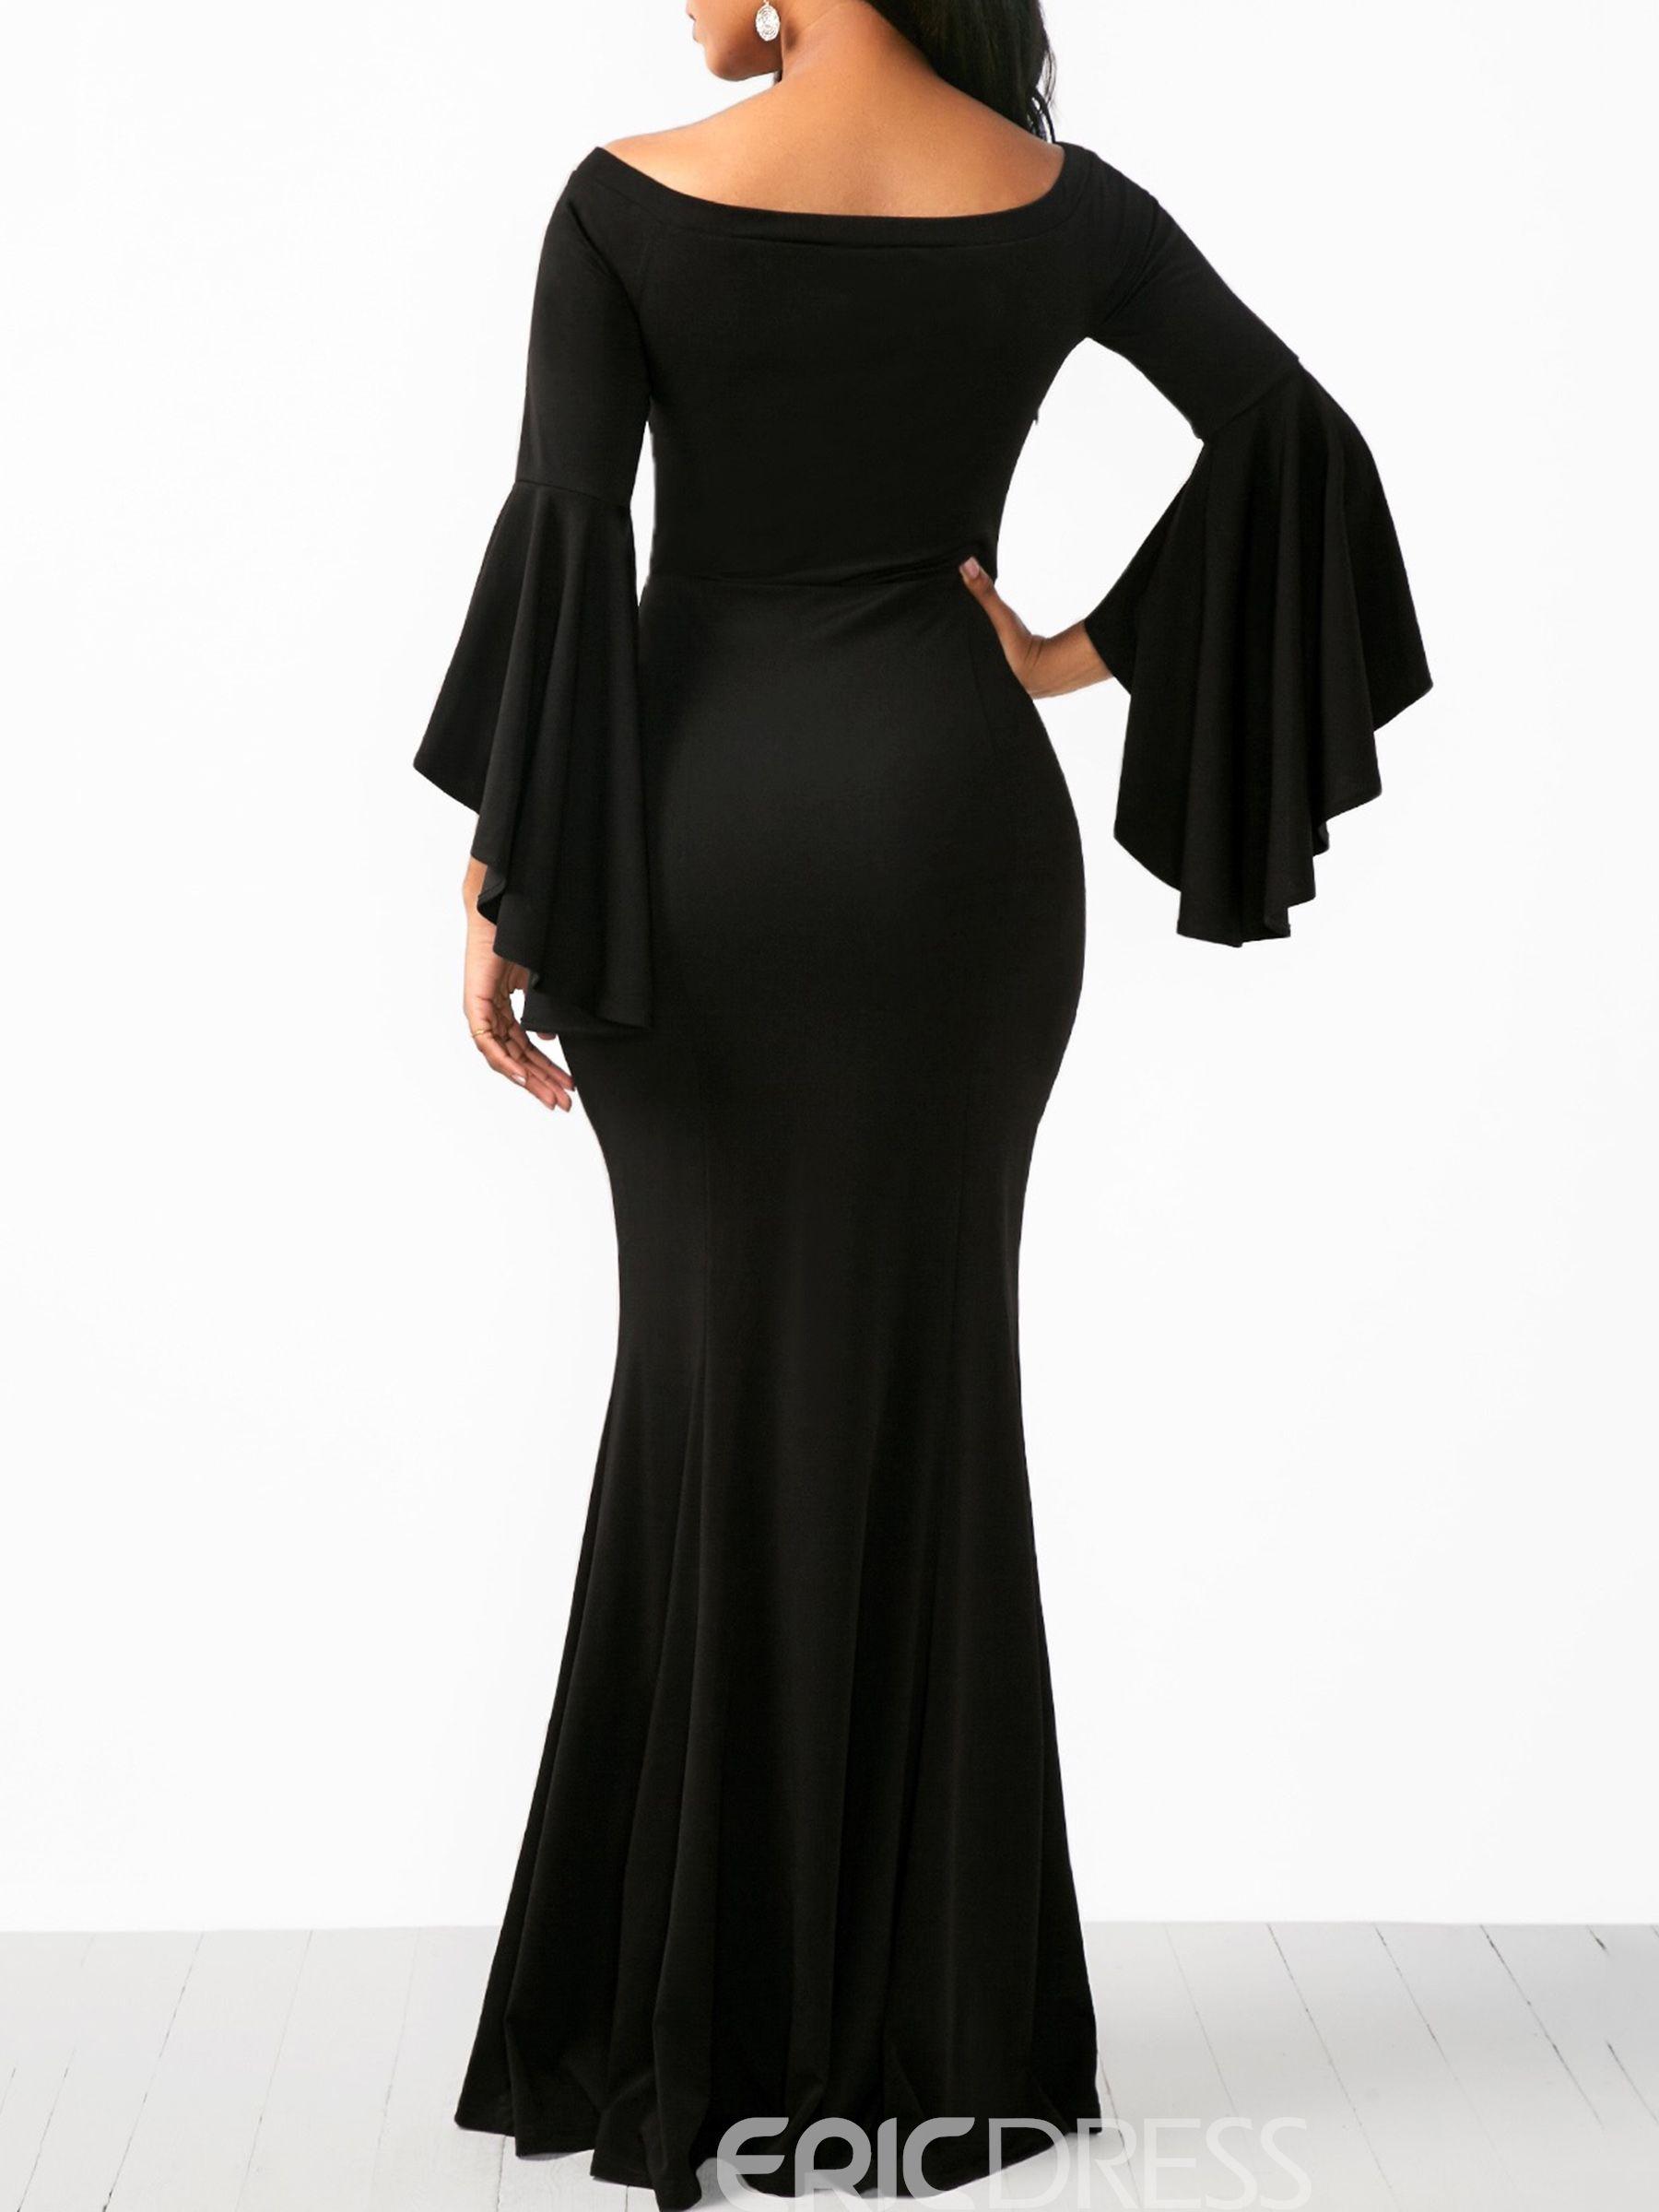 bfb092219fd Ericdress Black Ruffle Sleeve Plain Women s Maxi Dress